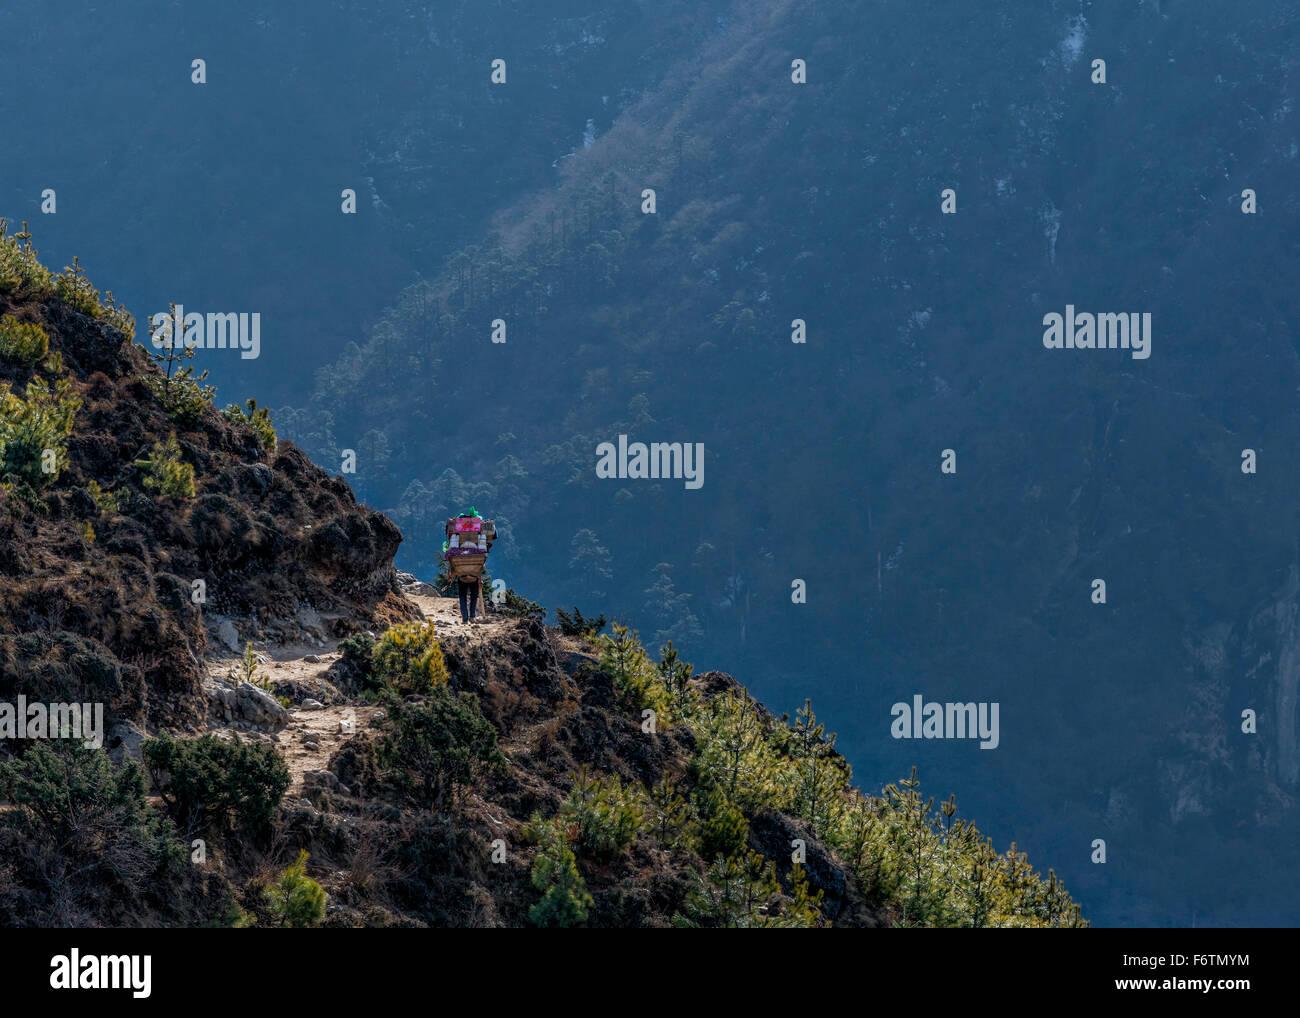 Nepal, Himalaya, Khumbu, trekker on hiking trail - Stock Image